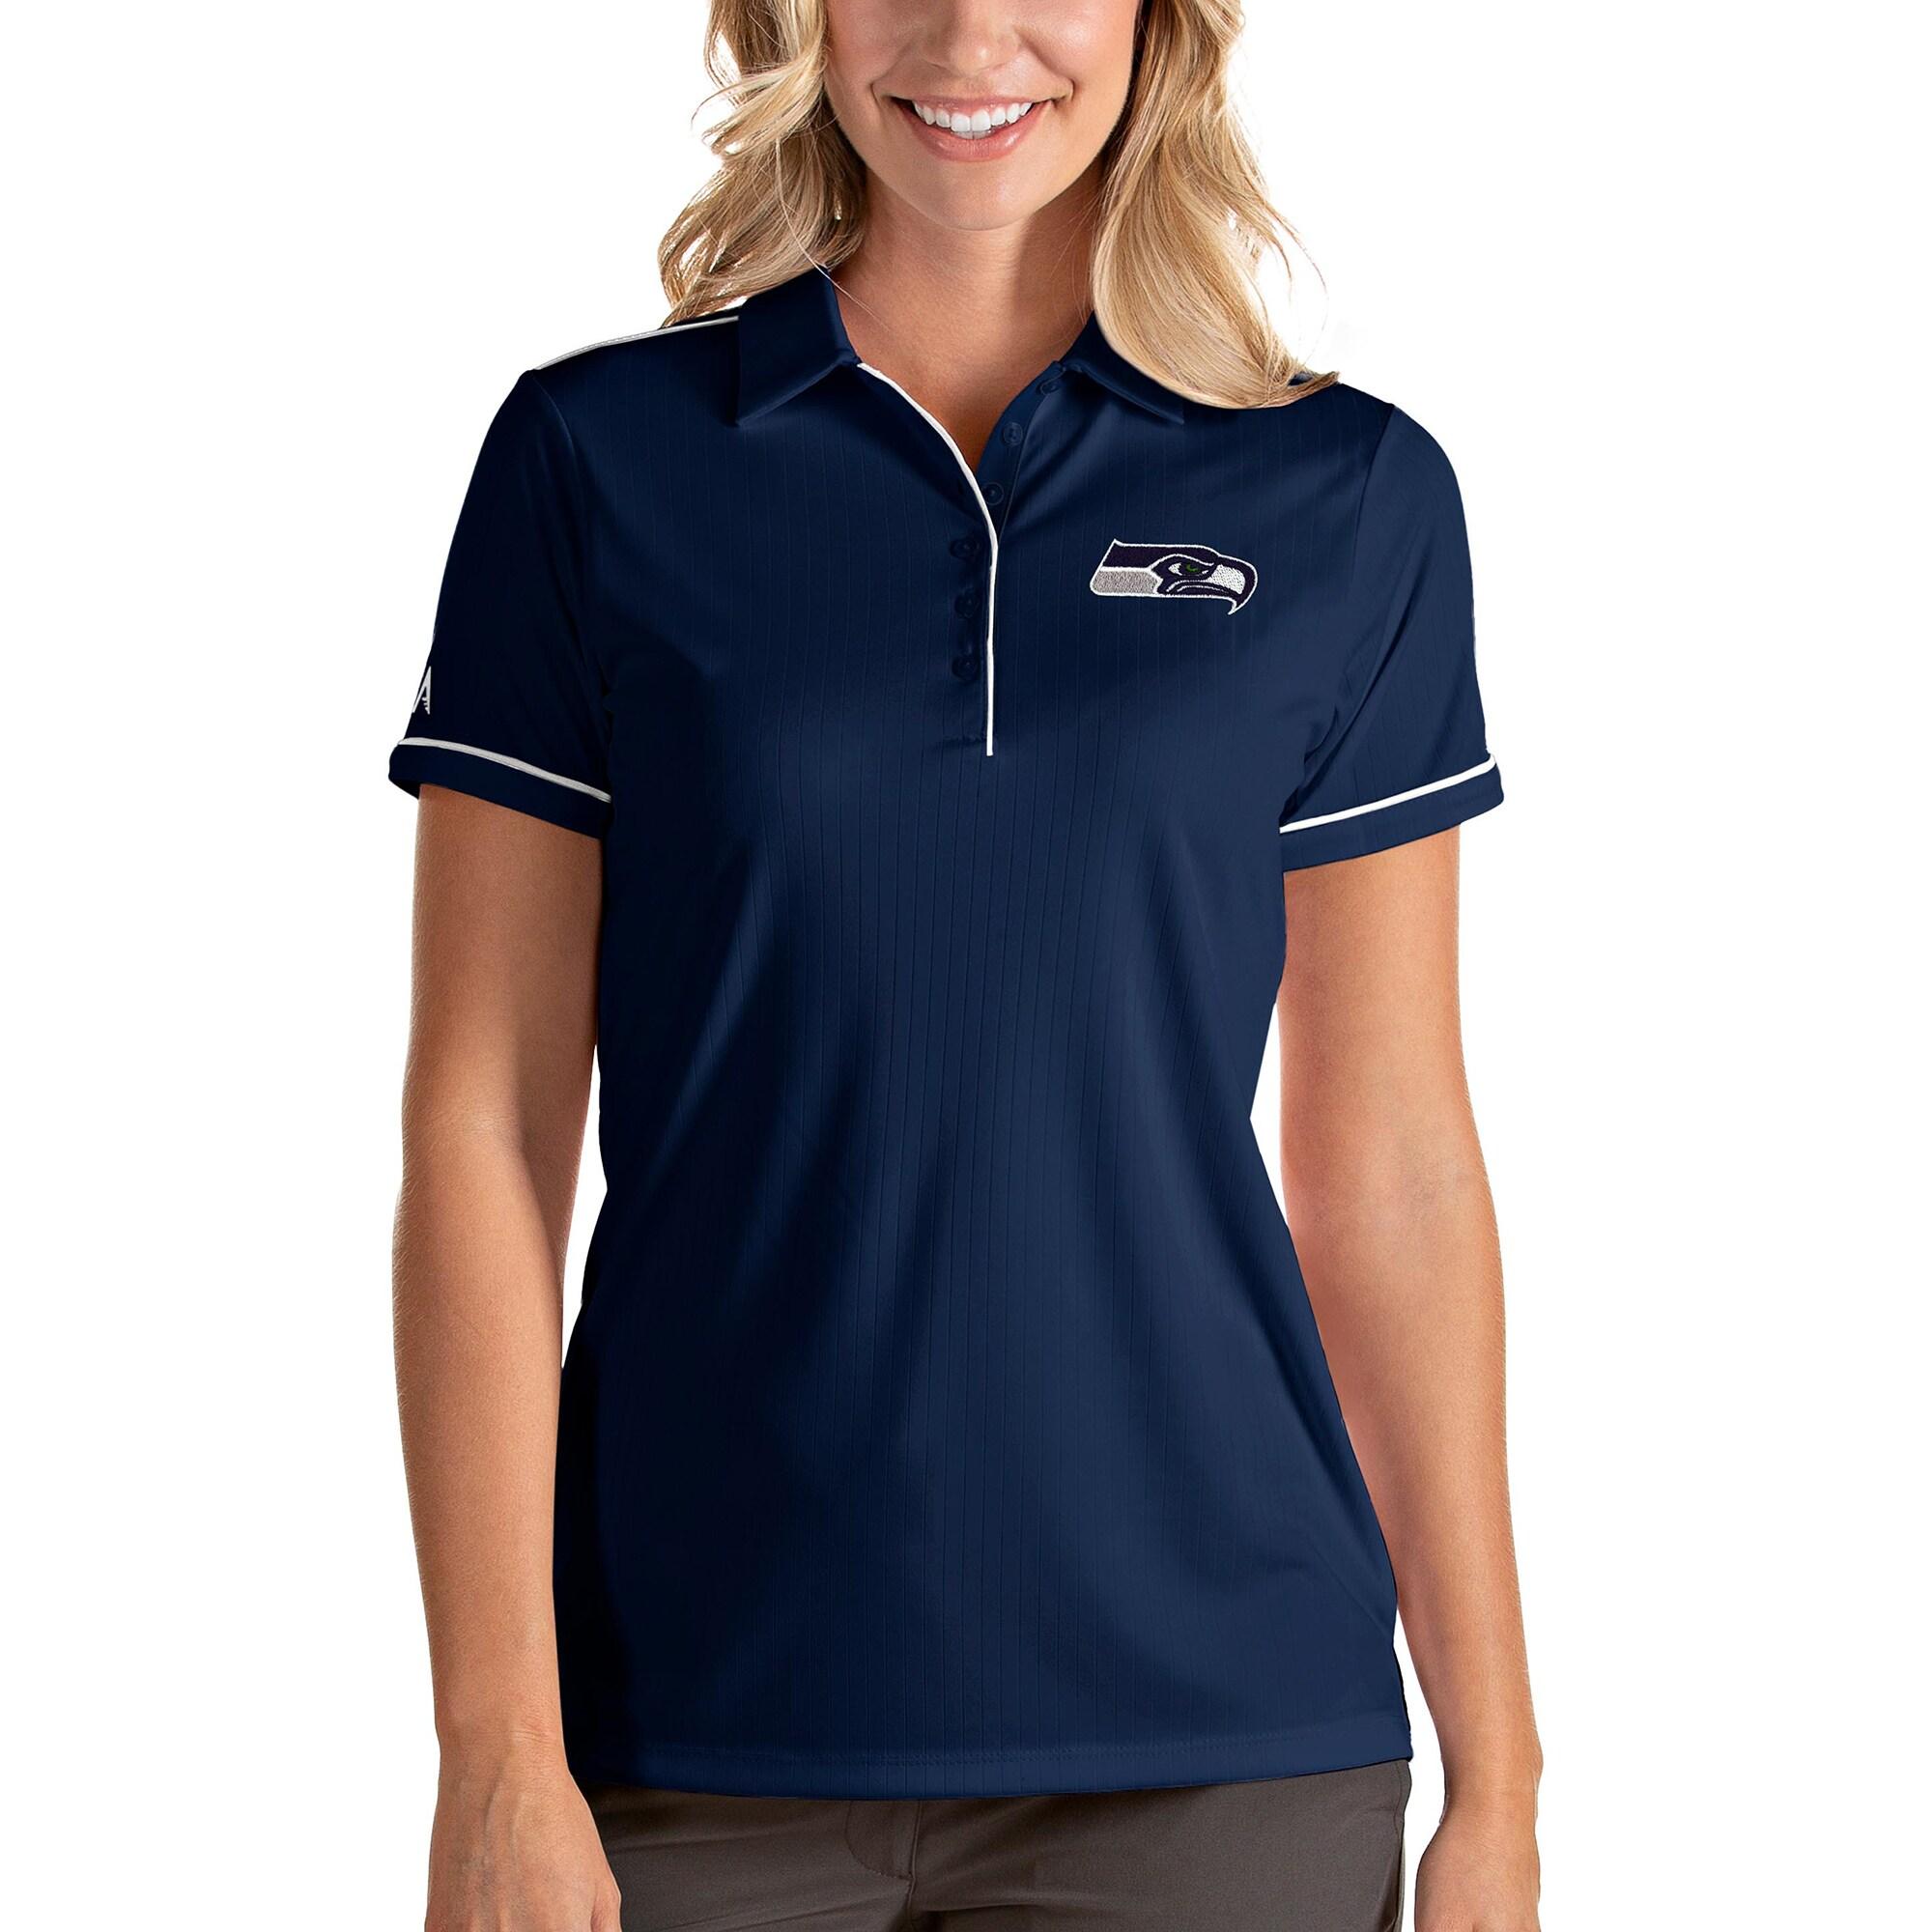 Seattle Seahawks Antigua Women's Salute Polo - Navy